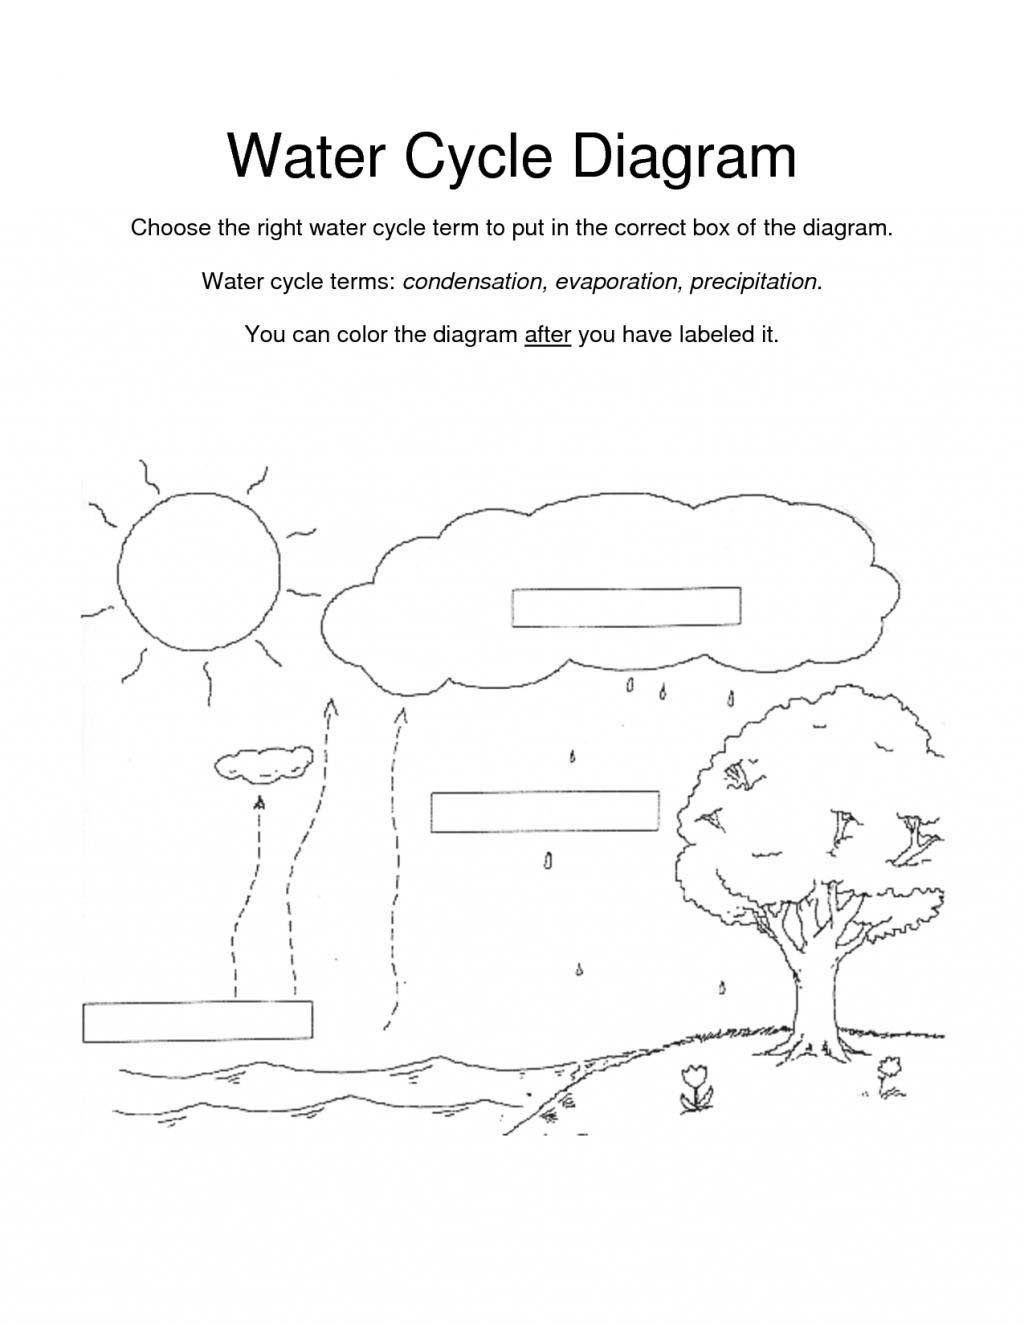 Carbon Cycle Diagram Worksheet Pin By Diagram Bacamajalah On Tips References In 2020 Water Cycle Diagram Water Cycle Worksheet Simple Water Cycle